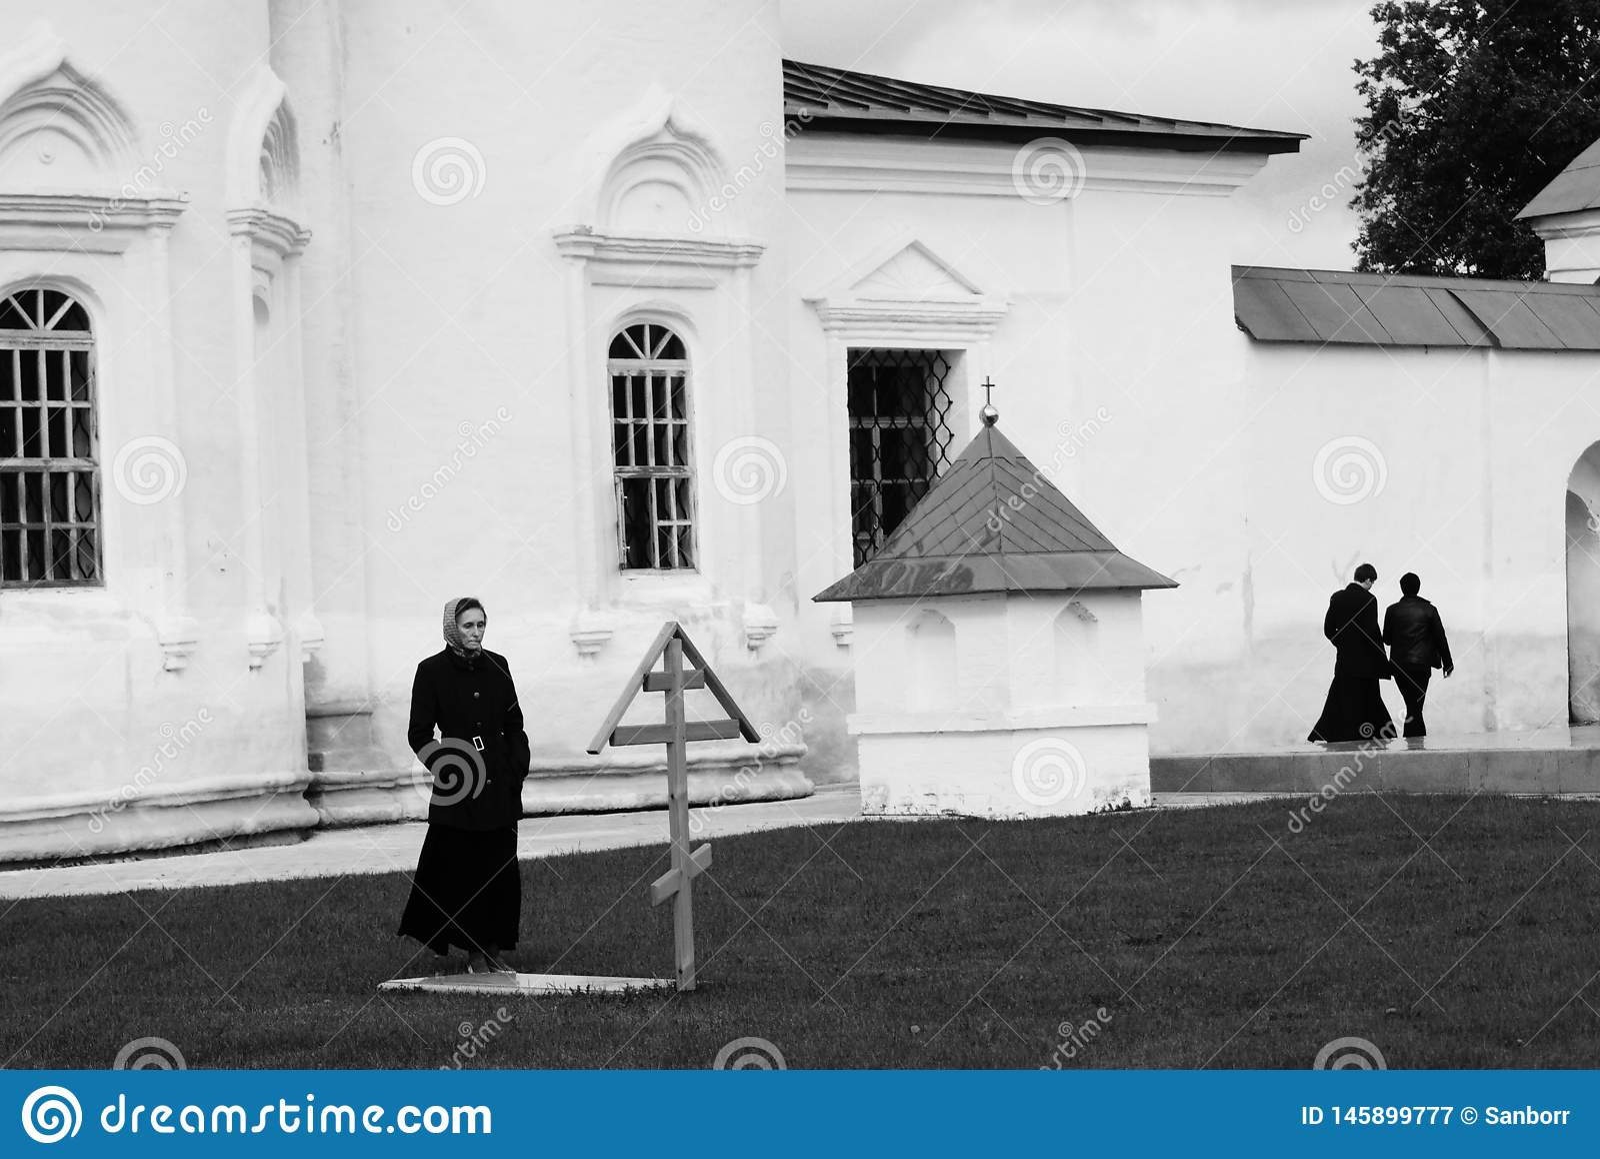 Tobolsk, Ρωσία, 10/05/2016: Μια γυναίκα επισκέπτεται τον τάφο σε ένα μοναστήρι Στο υπόβαθρο είναι οι ιερείς r